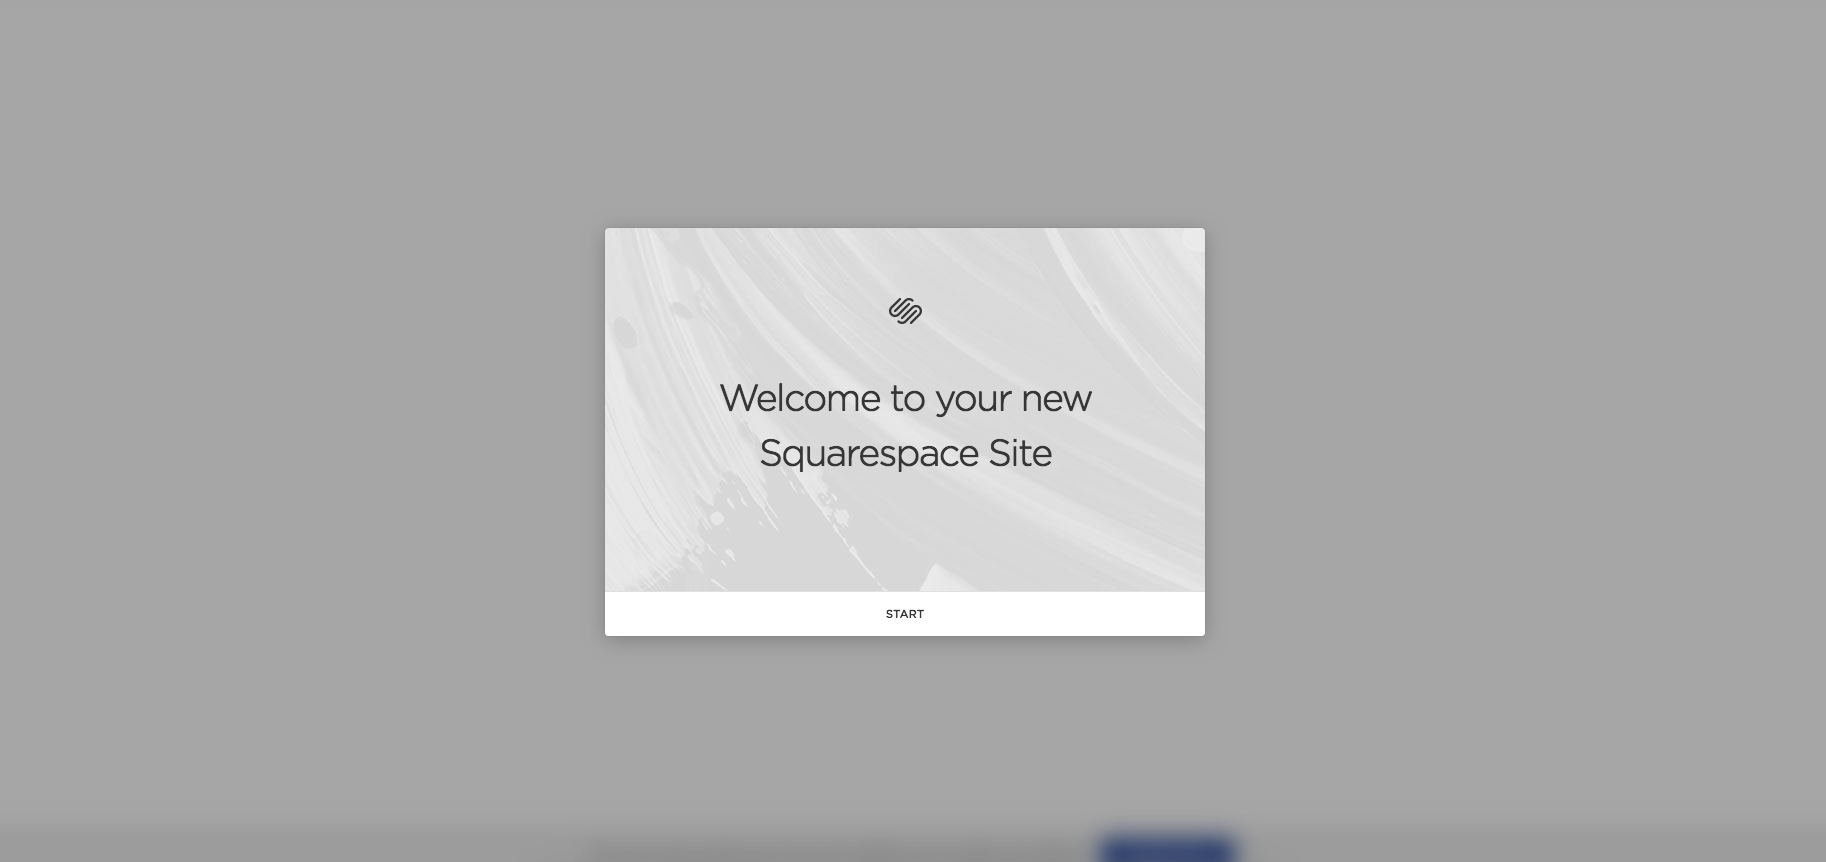 Welcome screen.